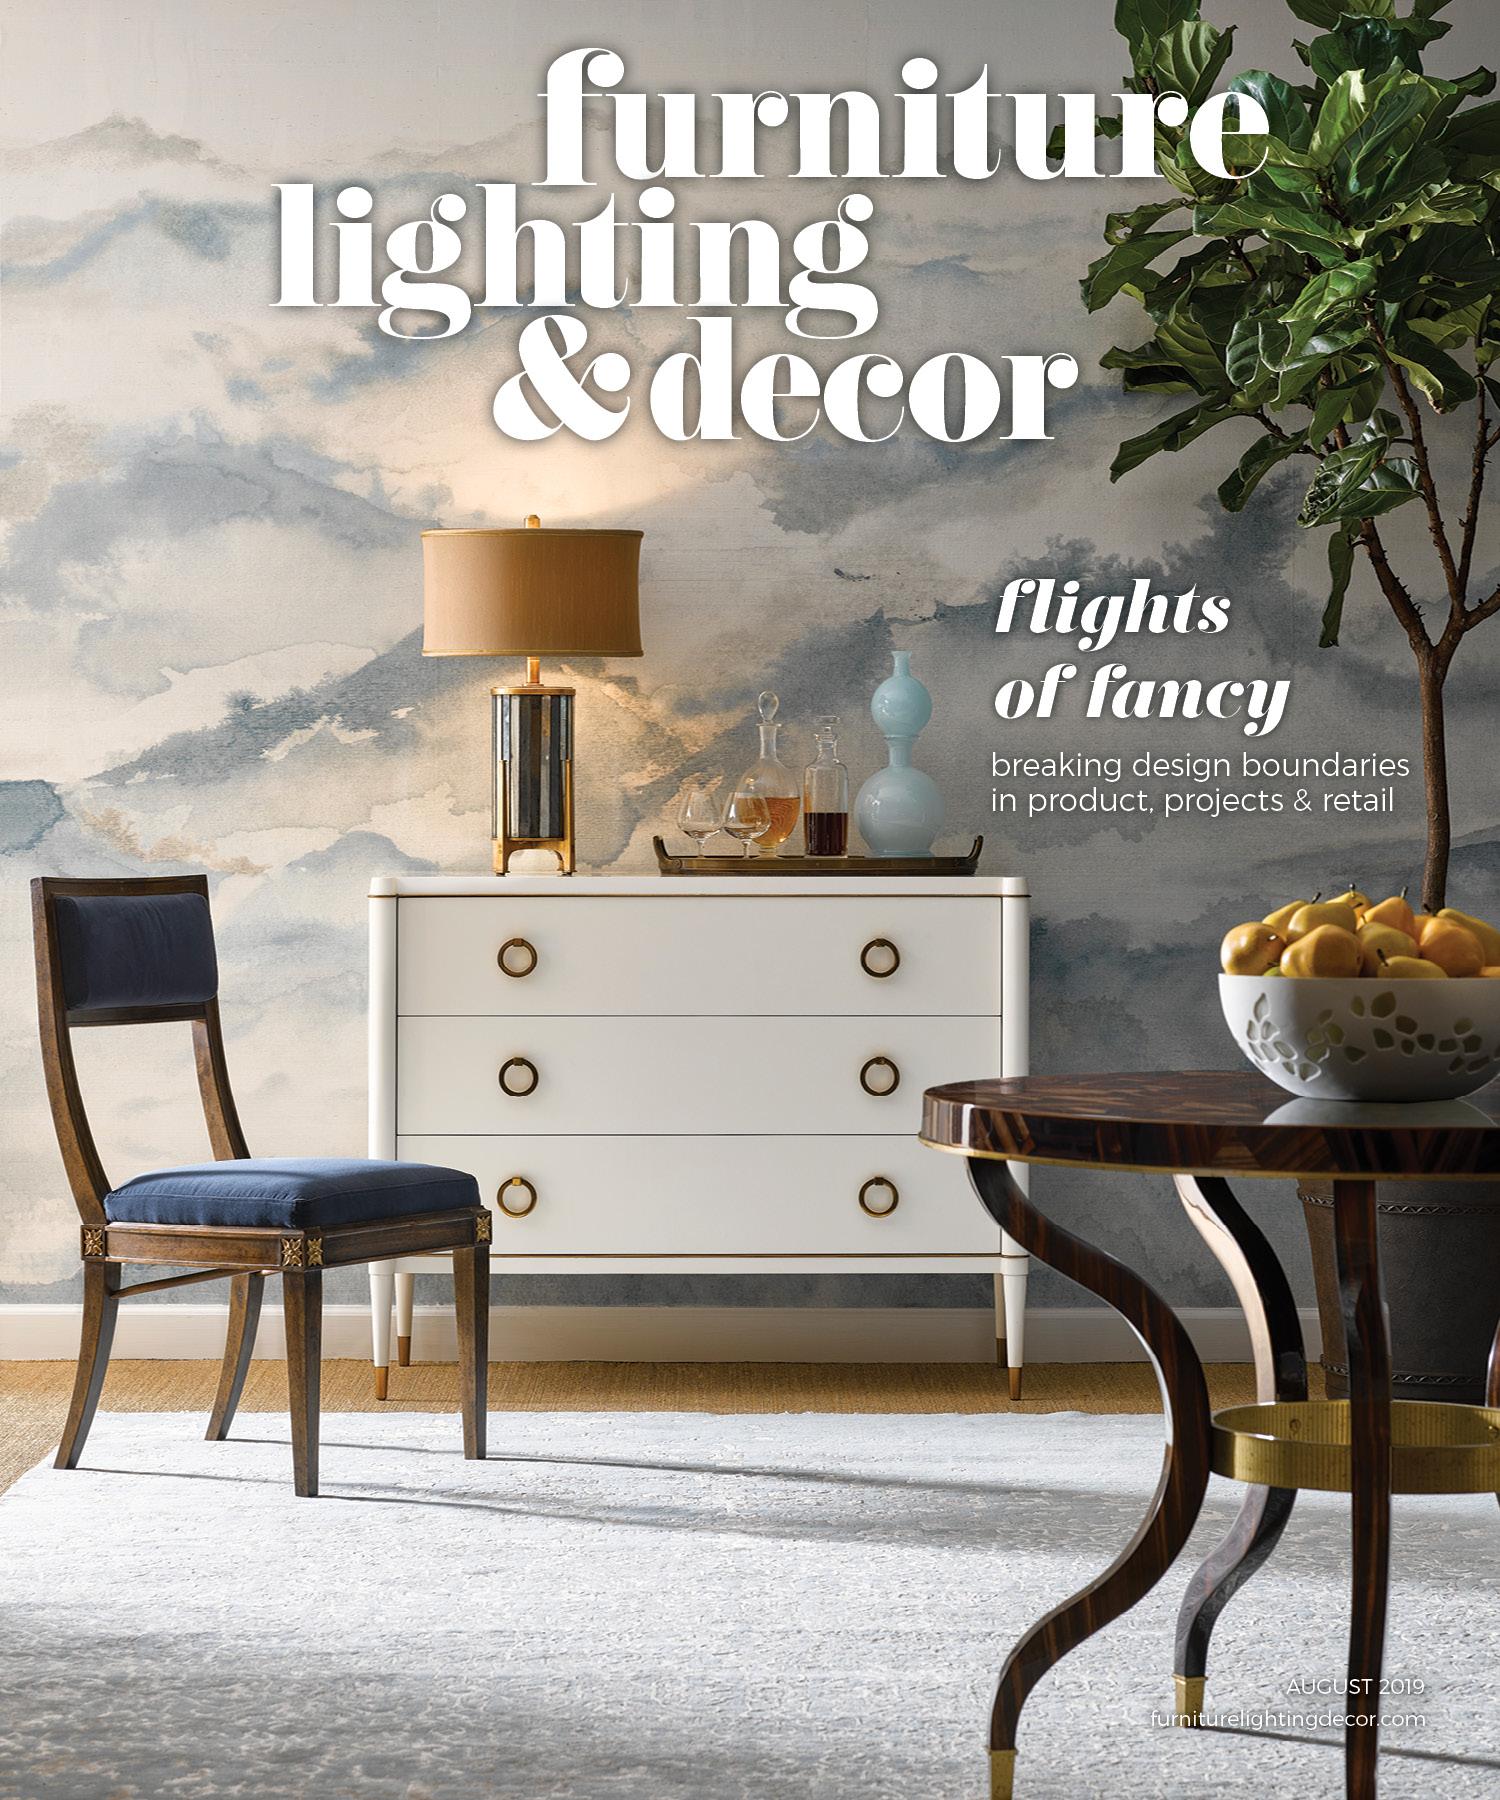 august 2019 furniture lighting decor